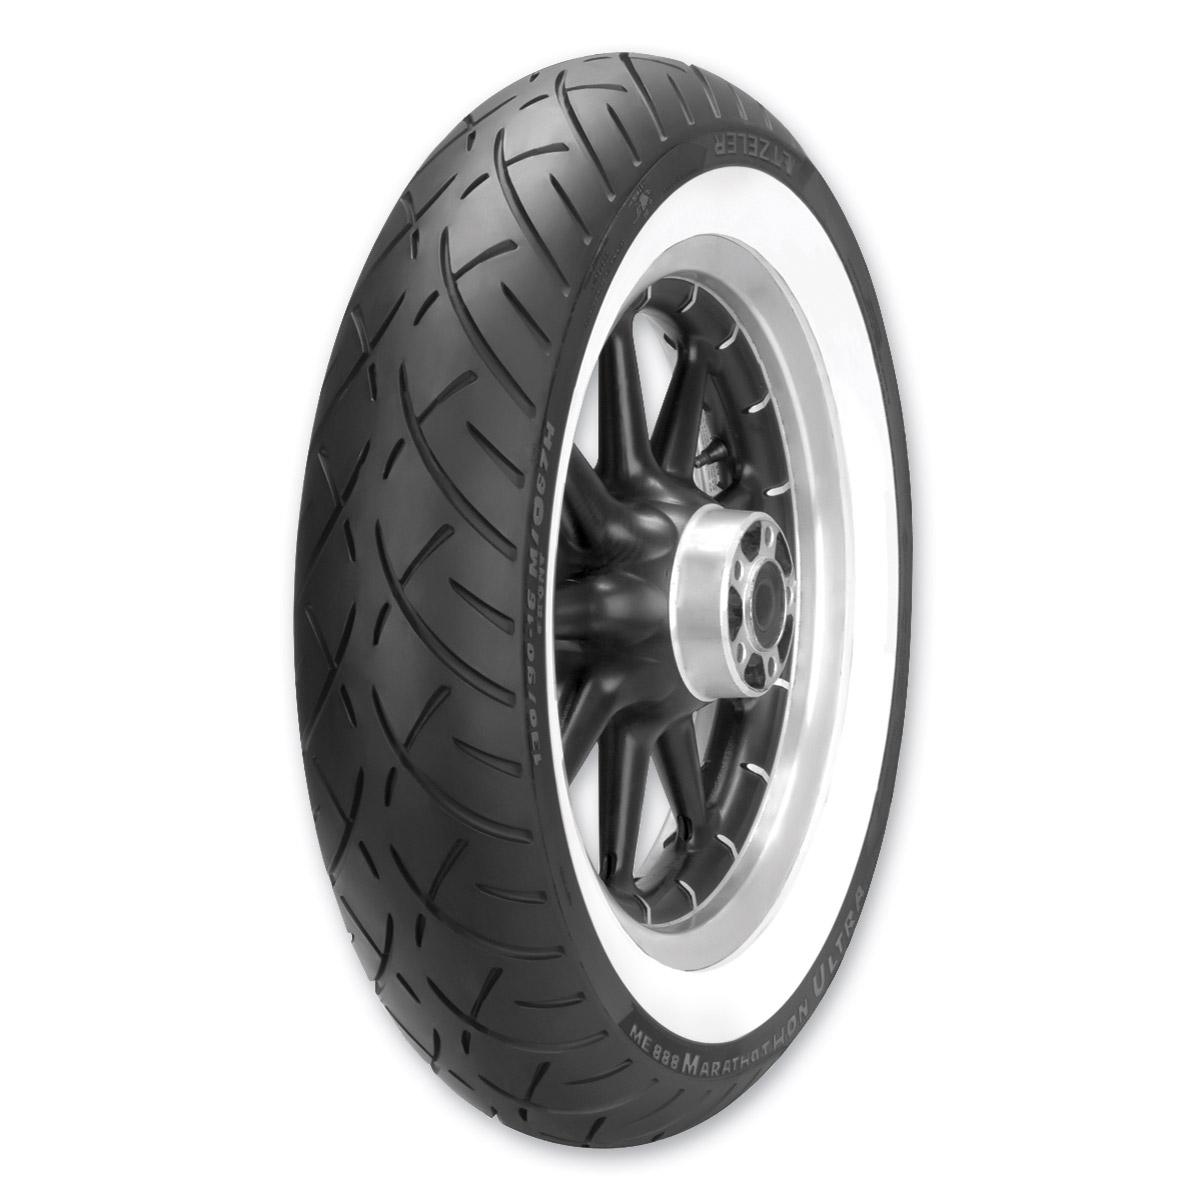 Metzeler ME888 Marathon Ultra 130/90-16 Wide Whitewall Front Tire